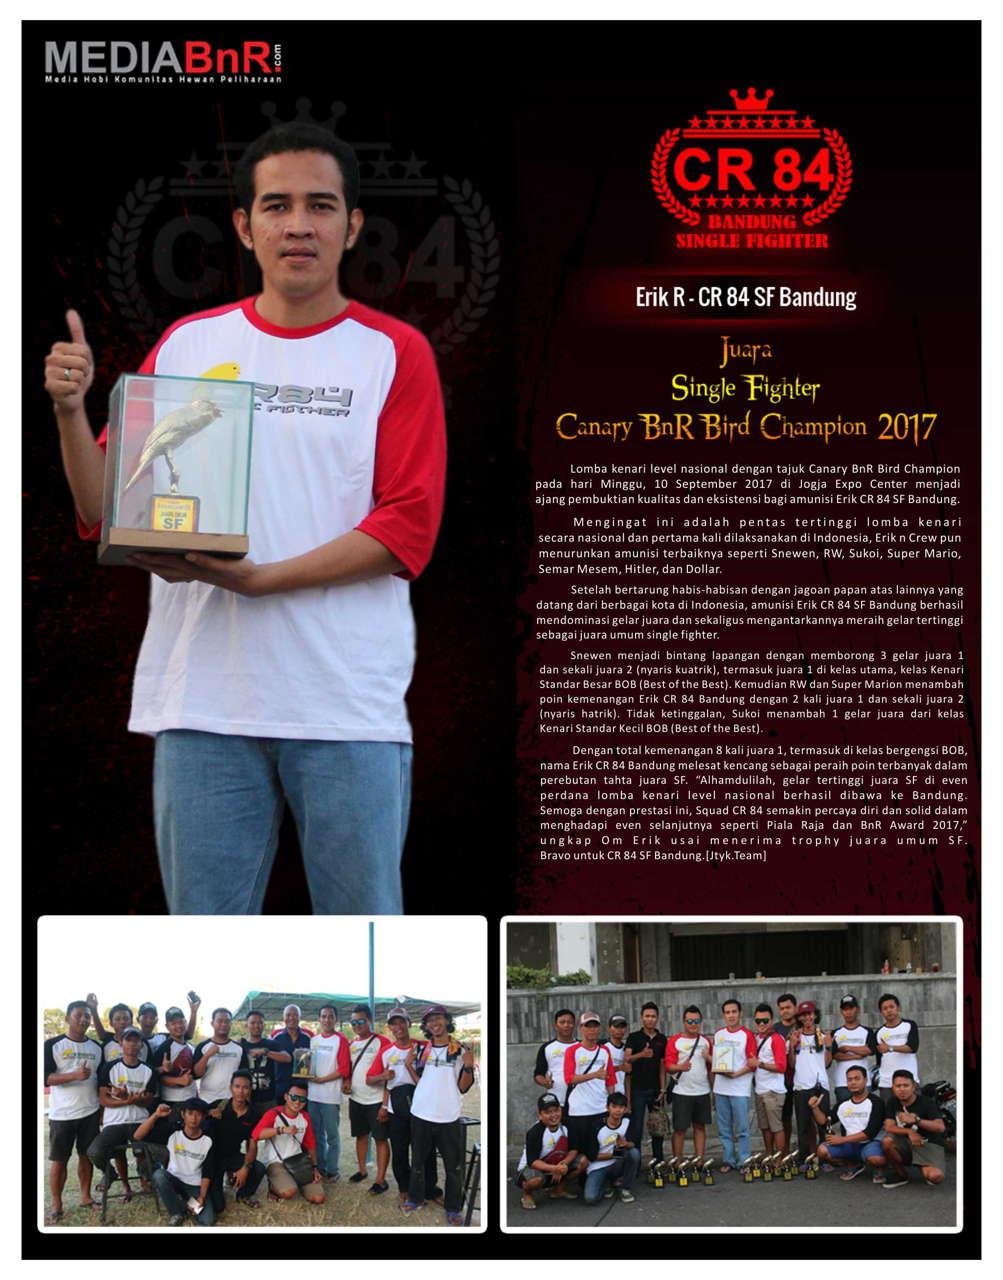 Profil Sang Juara Erik CR 84 SF Bandung di Canary BnR Bird Champion 10 September 2017